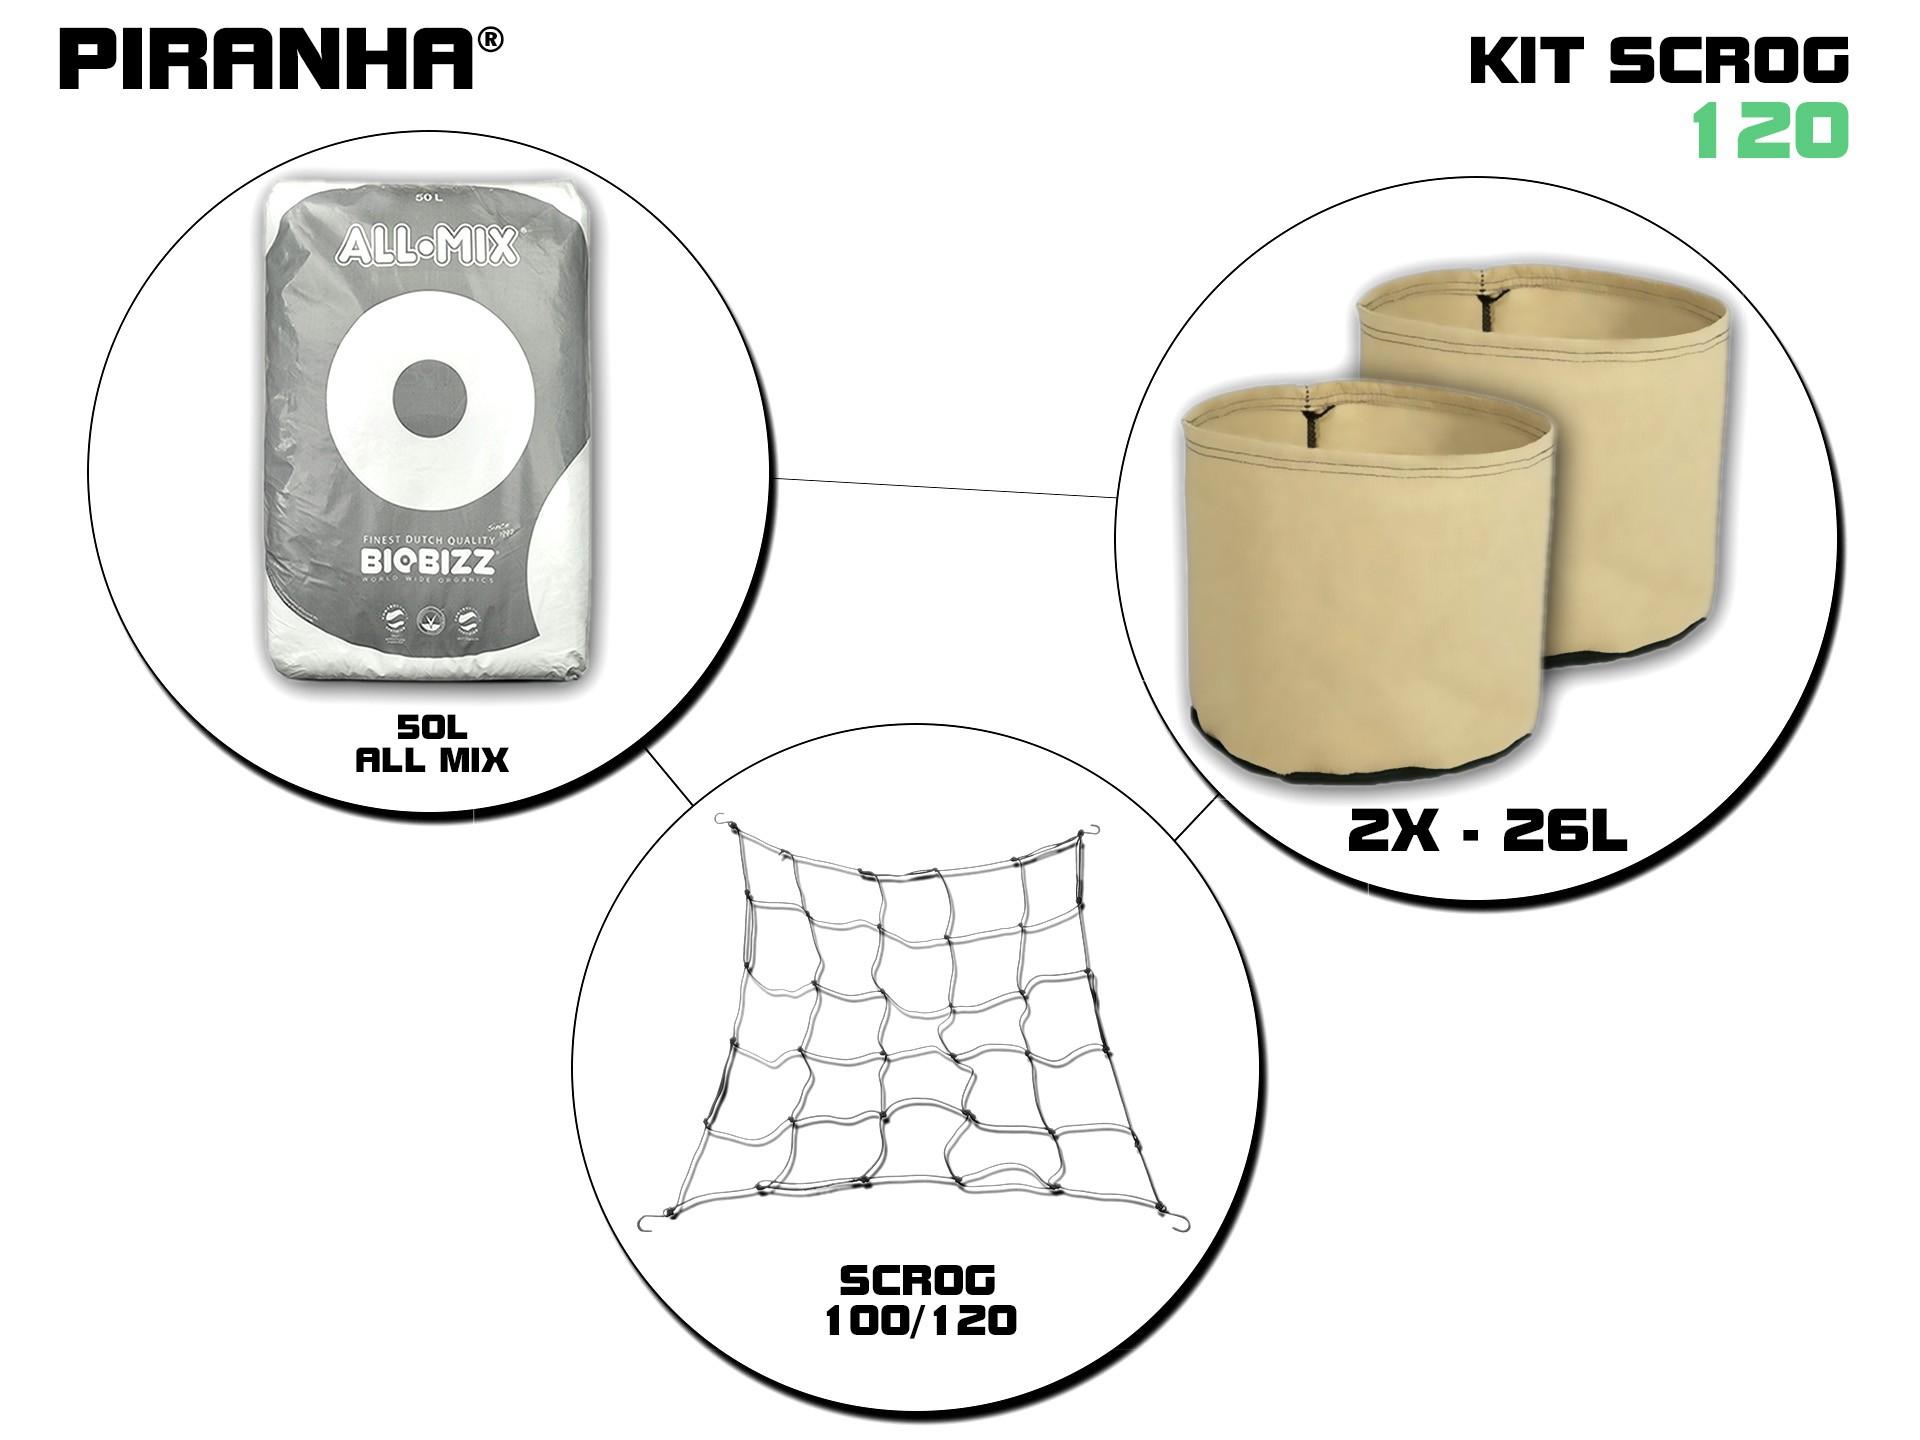 Kit SCROG 120